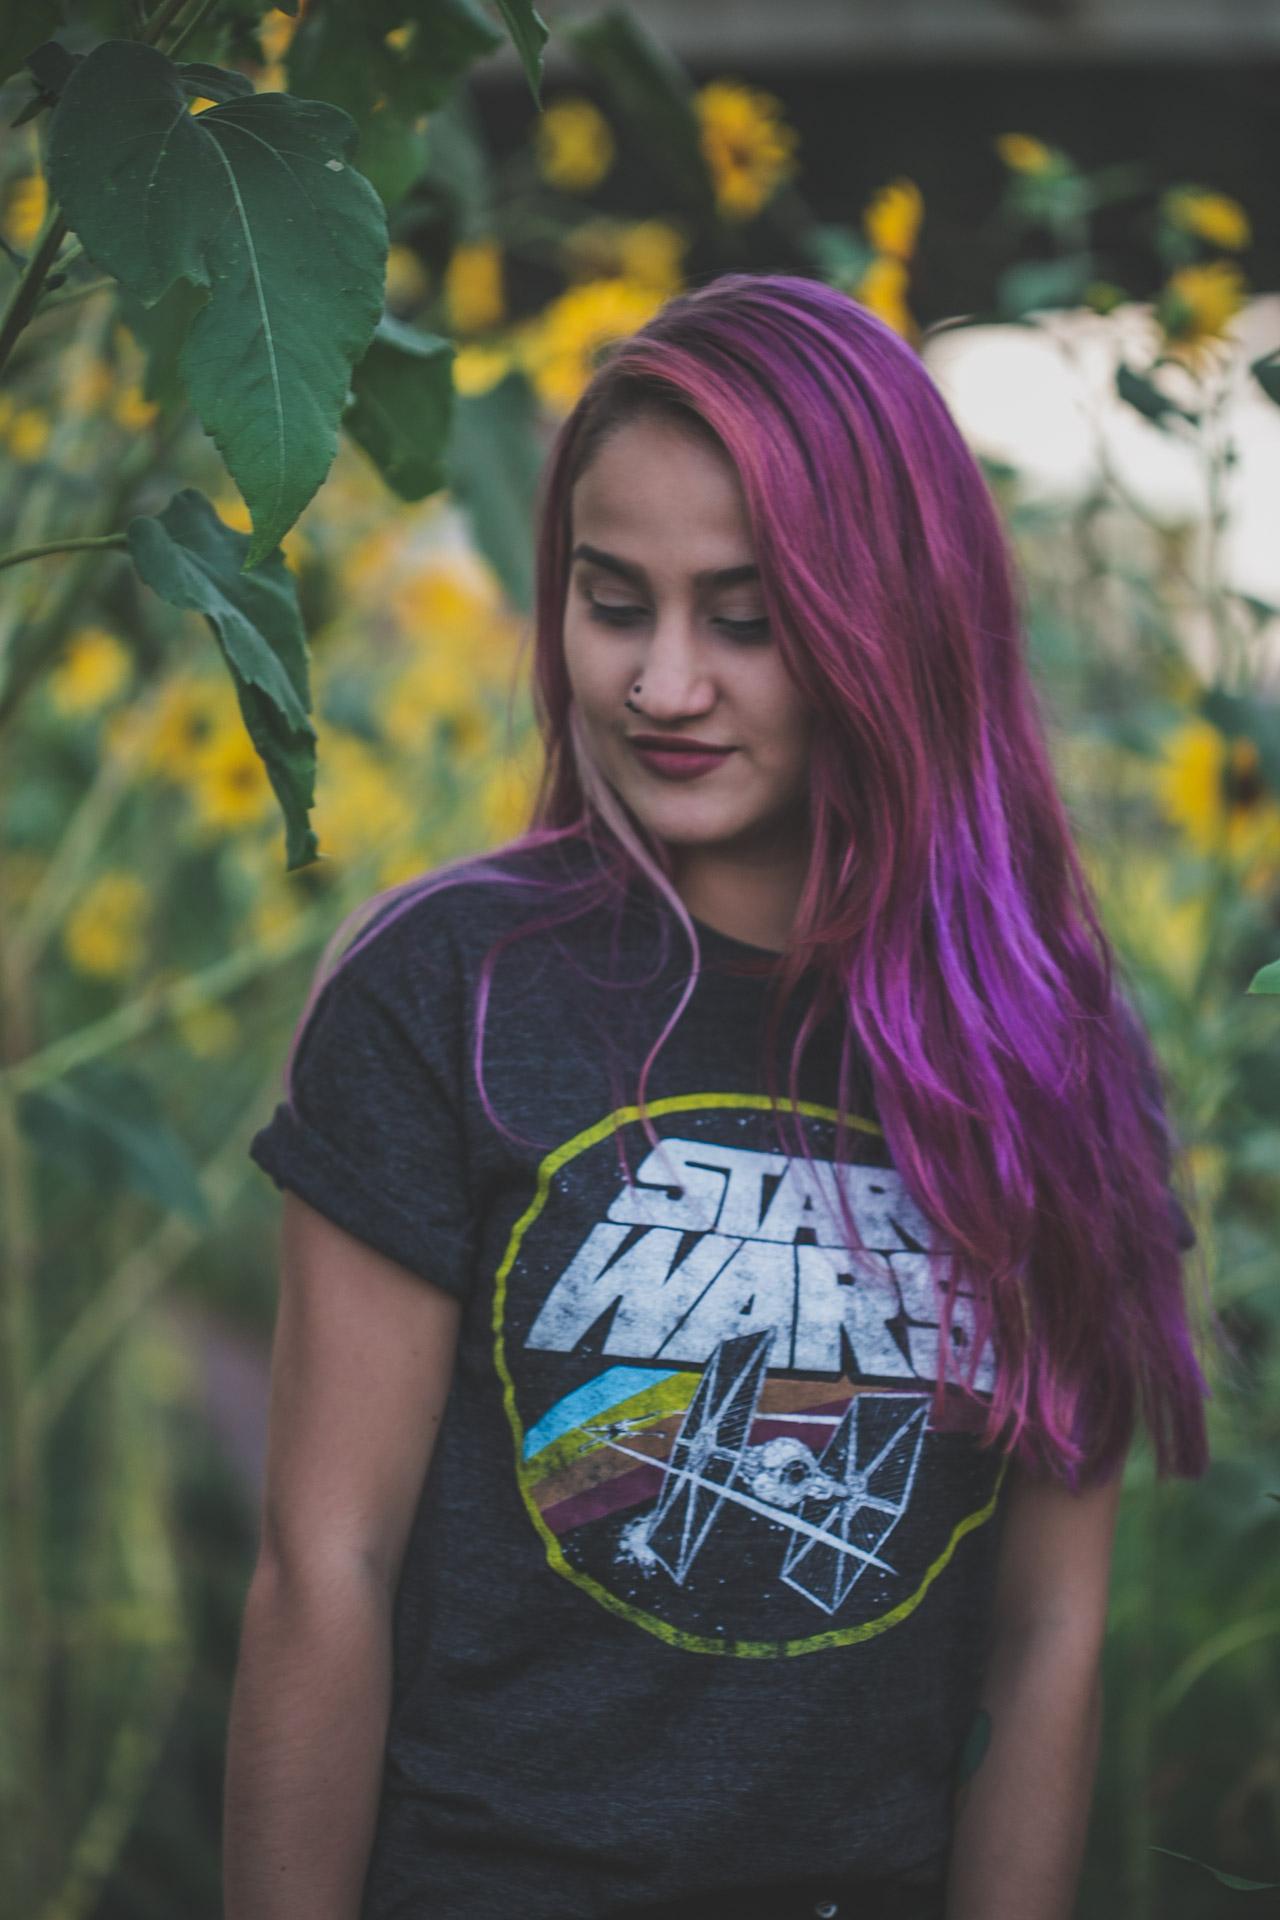 purple hair - star wars - sunflowers - tattoos